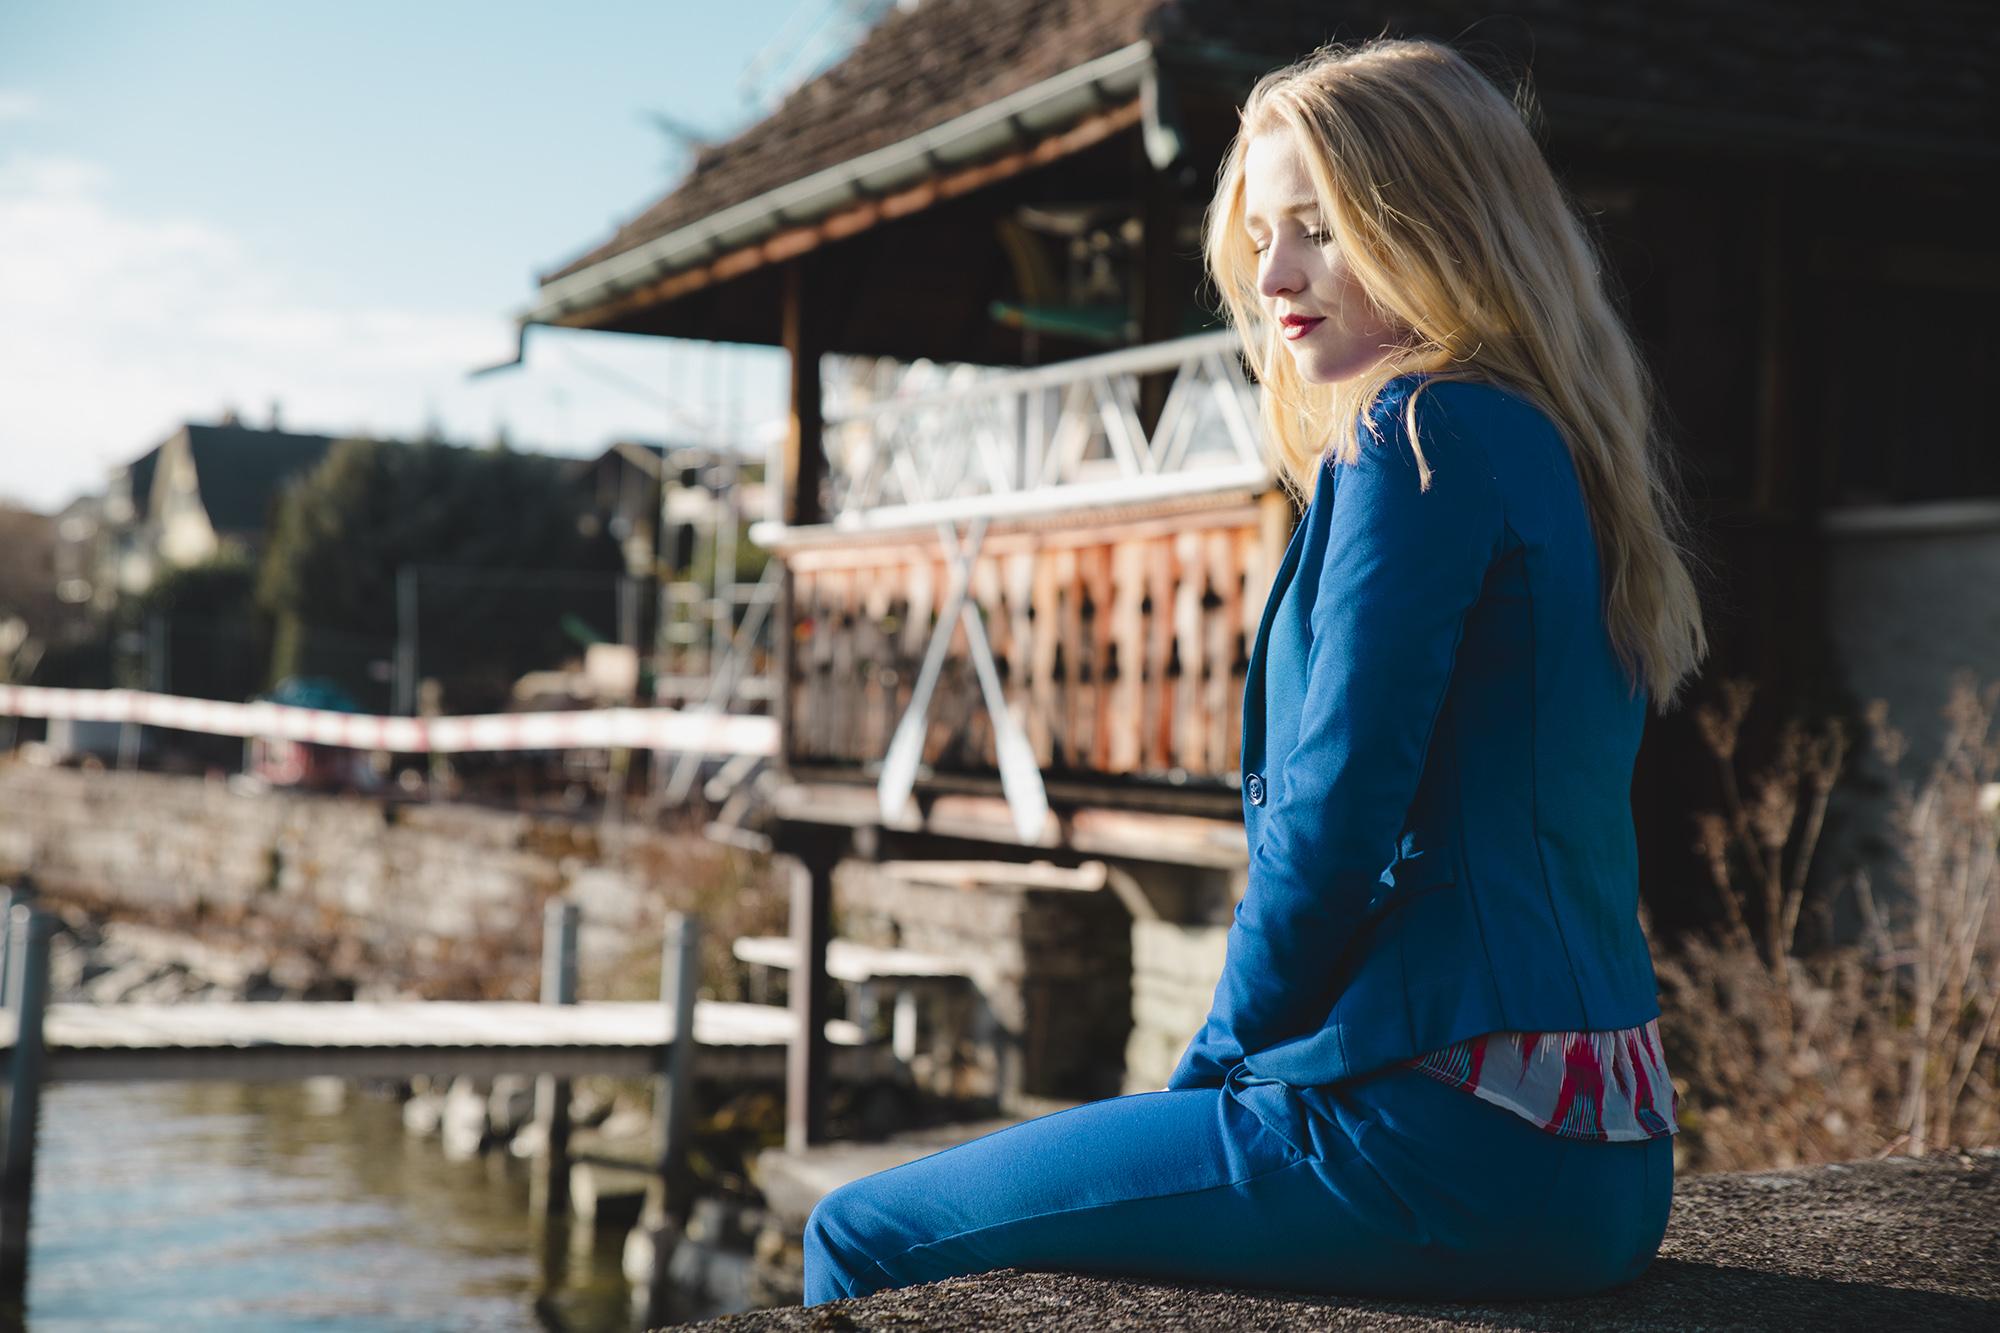 Get ready for Spring with Incognito Wiesbaden! - Frühlingsoutfit in knalligen Trendfarben Frühling 2018